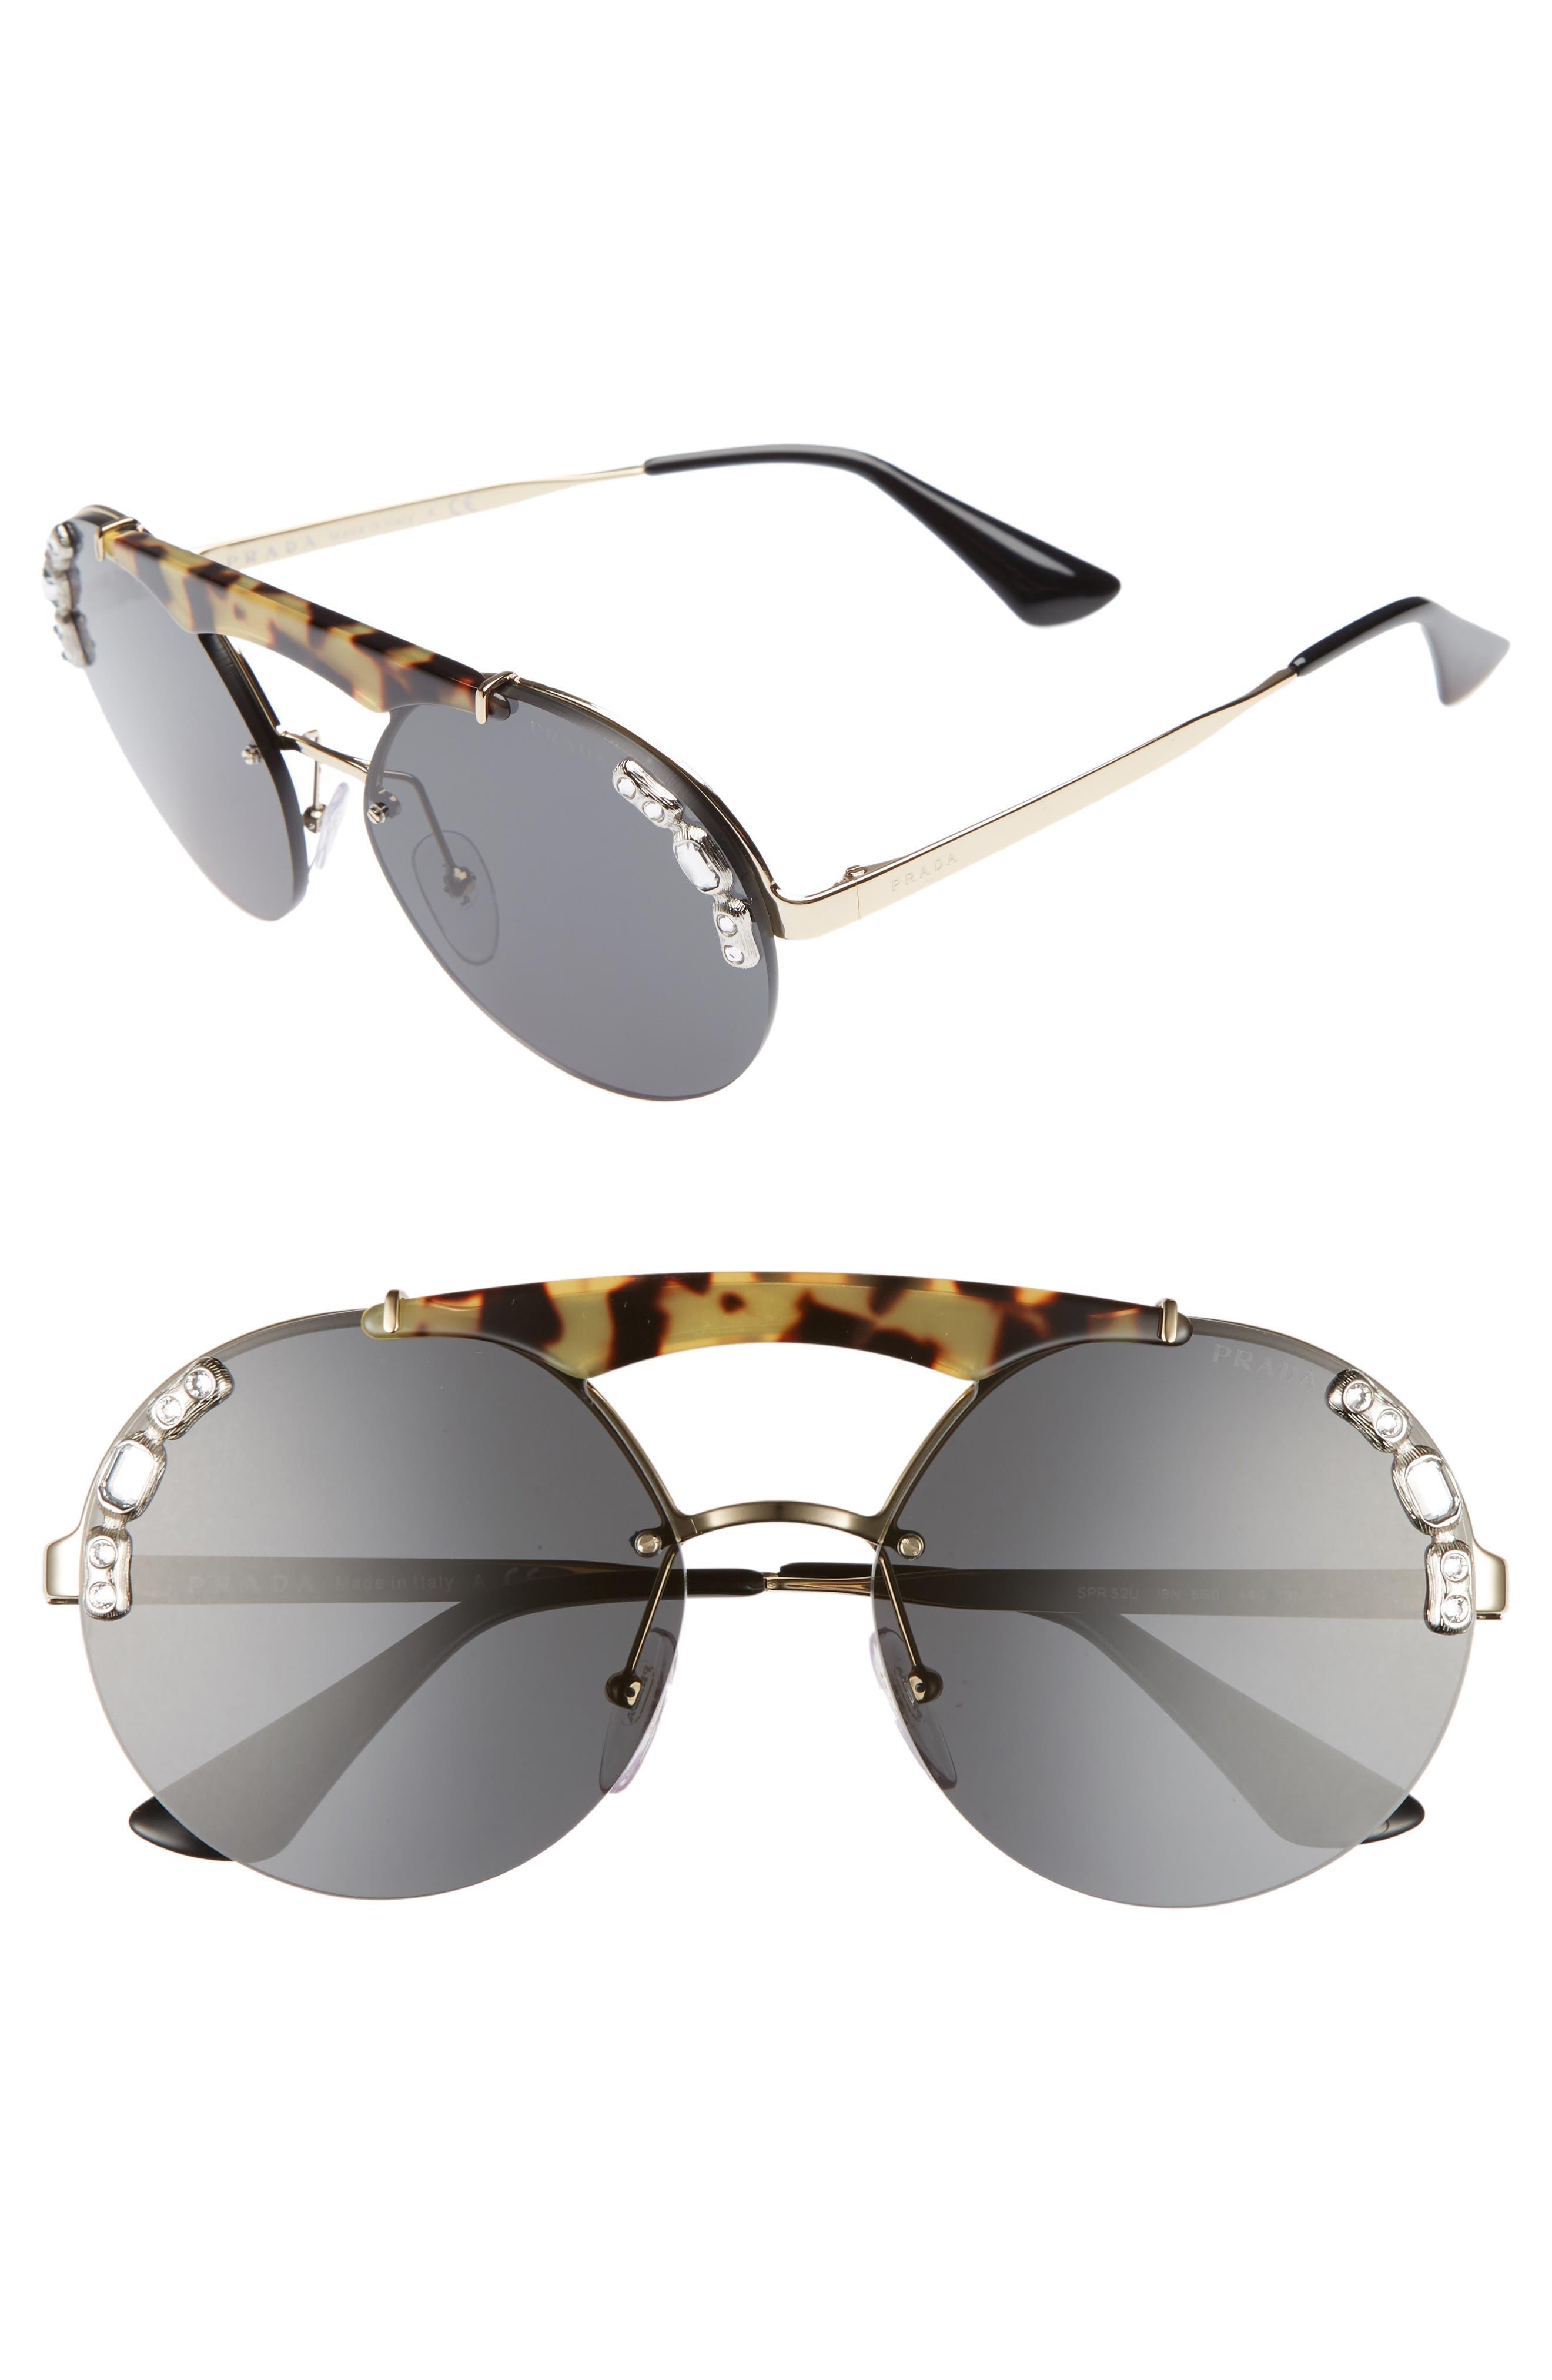 Main Image - Prada 52mm Embellished Round Rimless Sunglasses